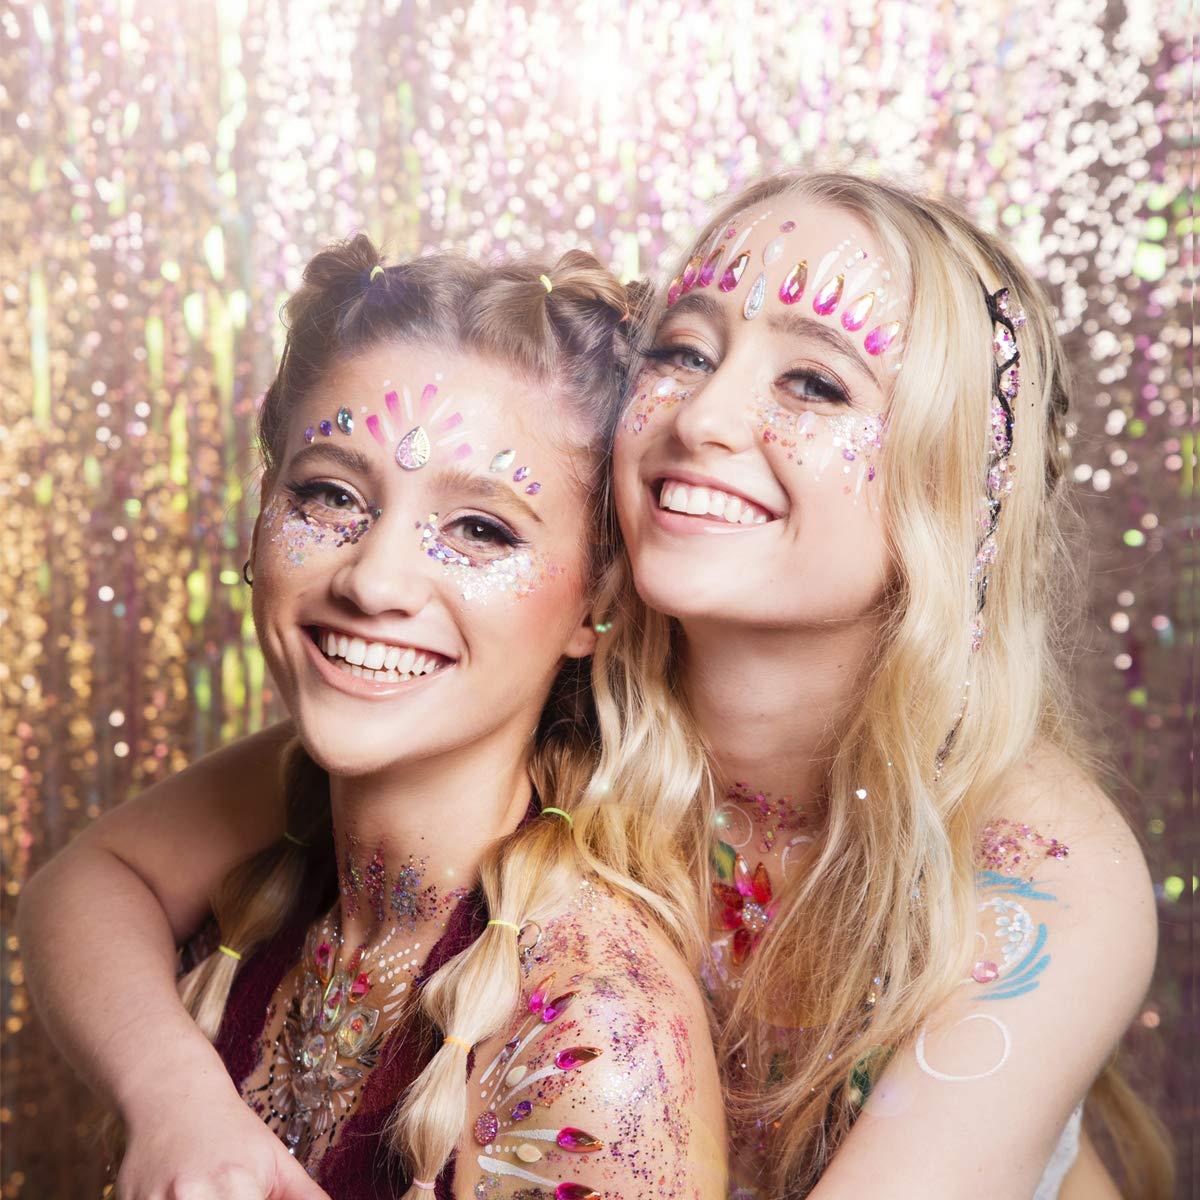 Body Glitter, Face Glitter Chunky Nail Glitter 6 Colors Cosmetic Glitters Makeup Glittter